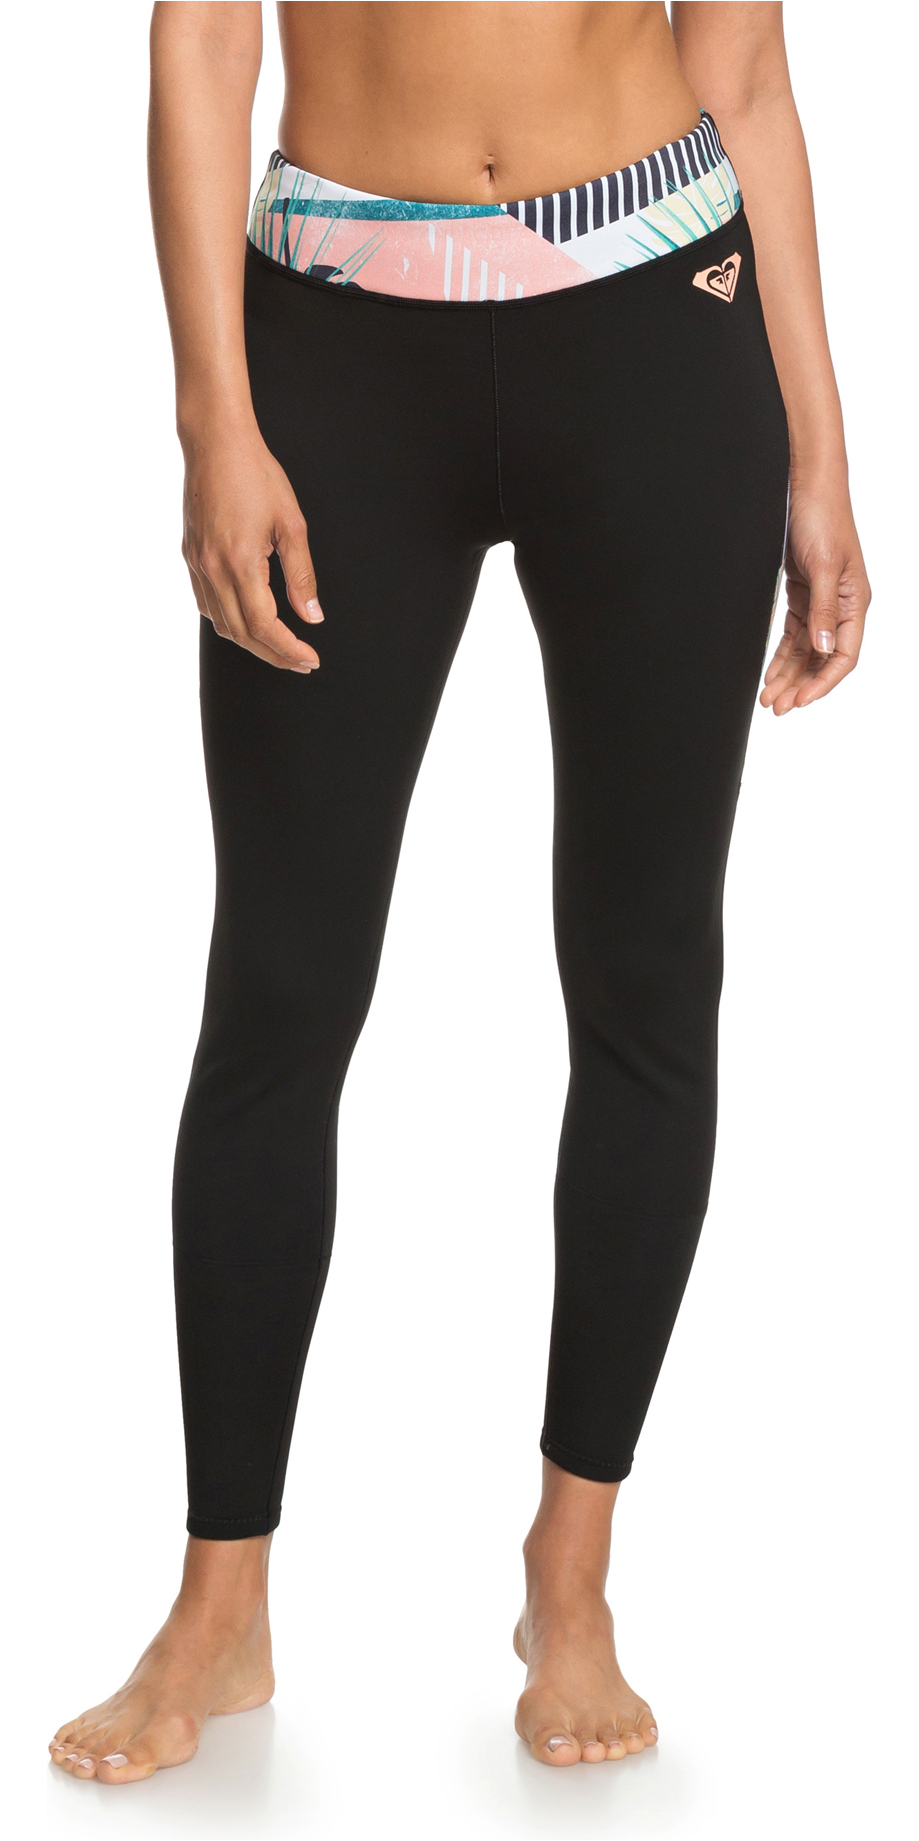 2019 Roxy Womens 1mm Pop Capri Leggings Black ERJWH03018